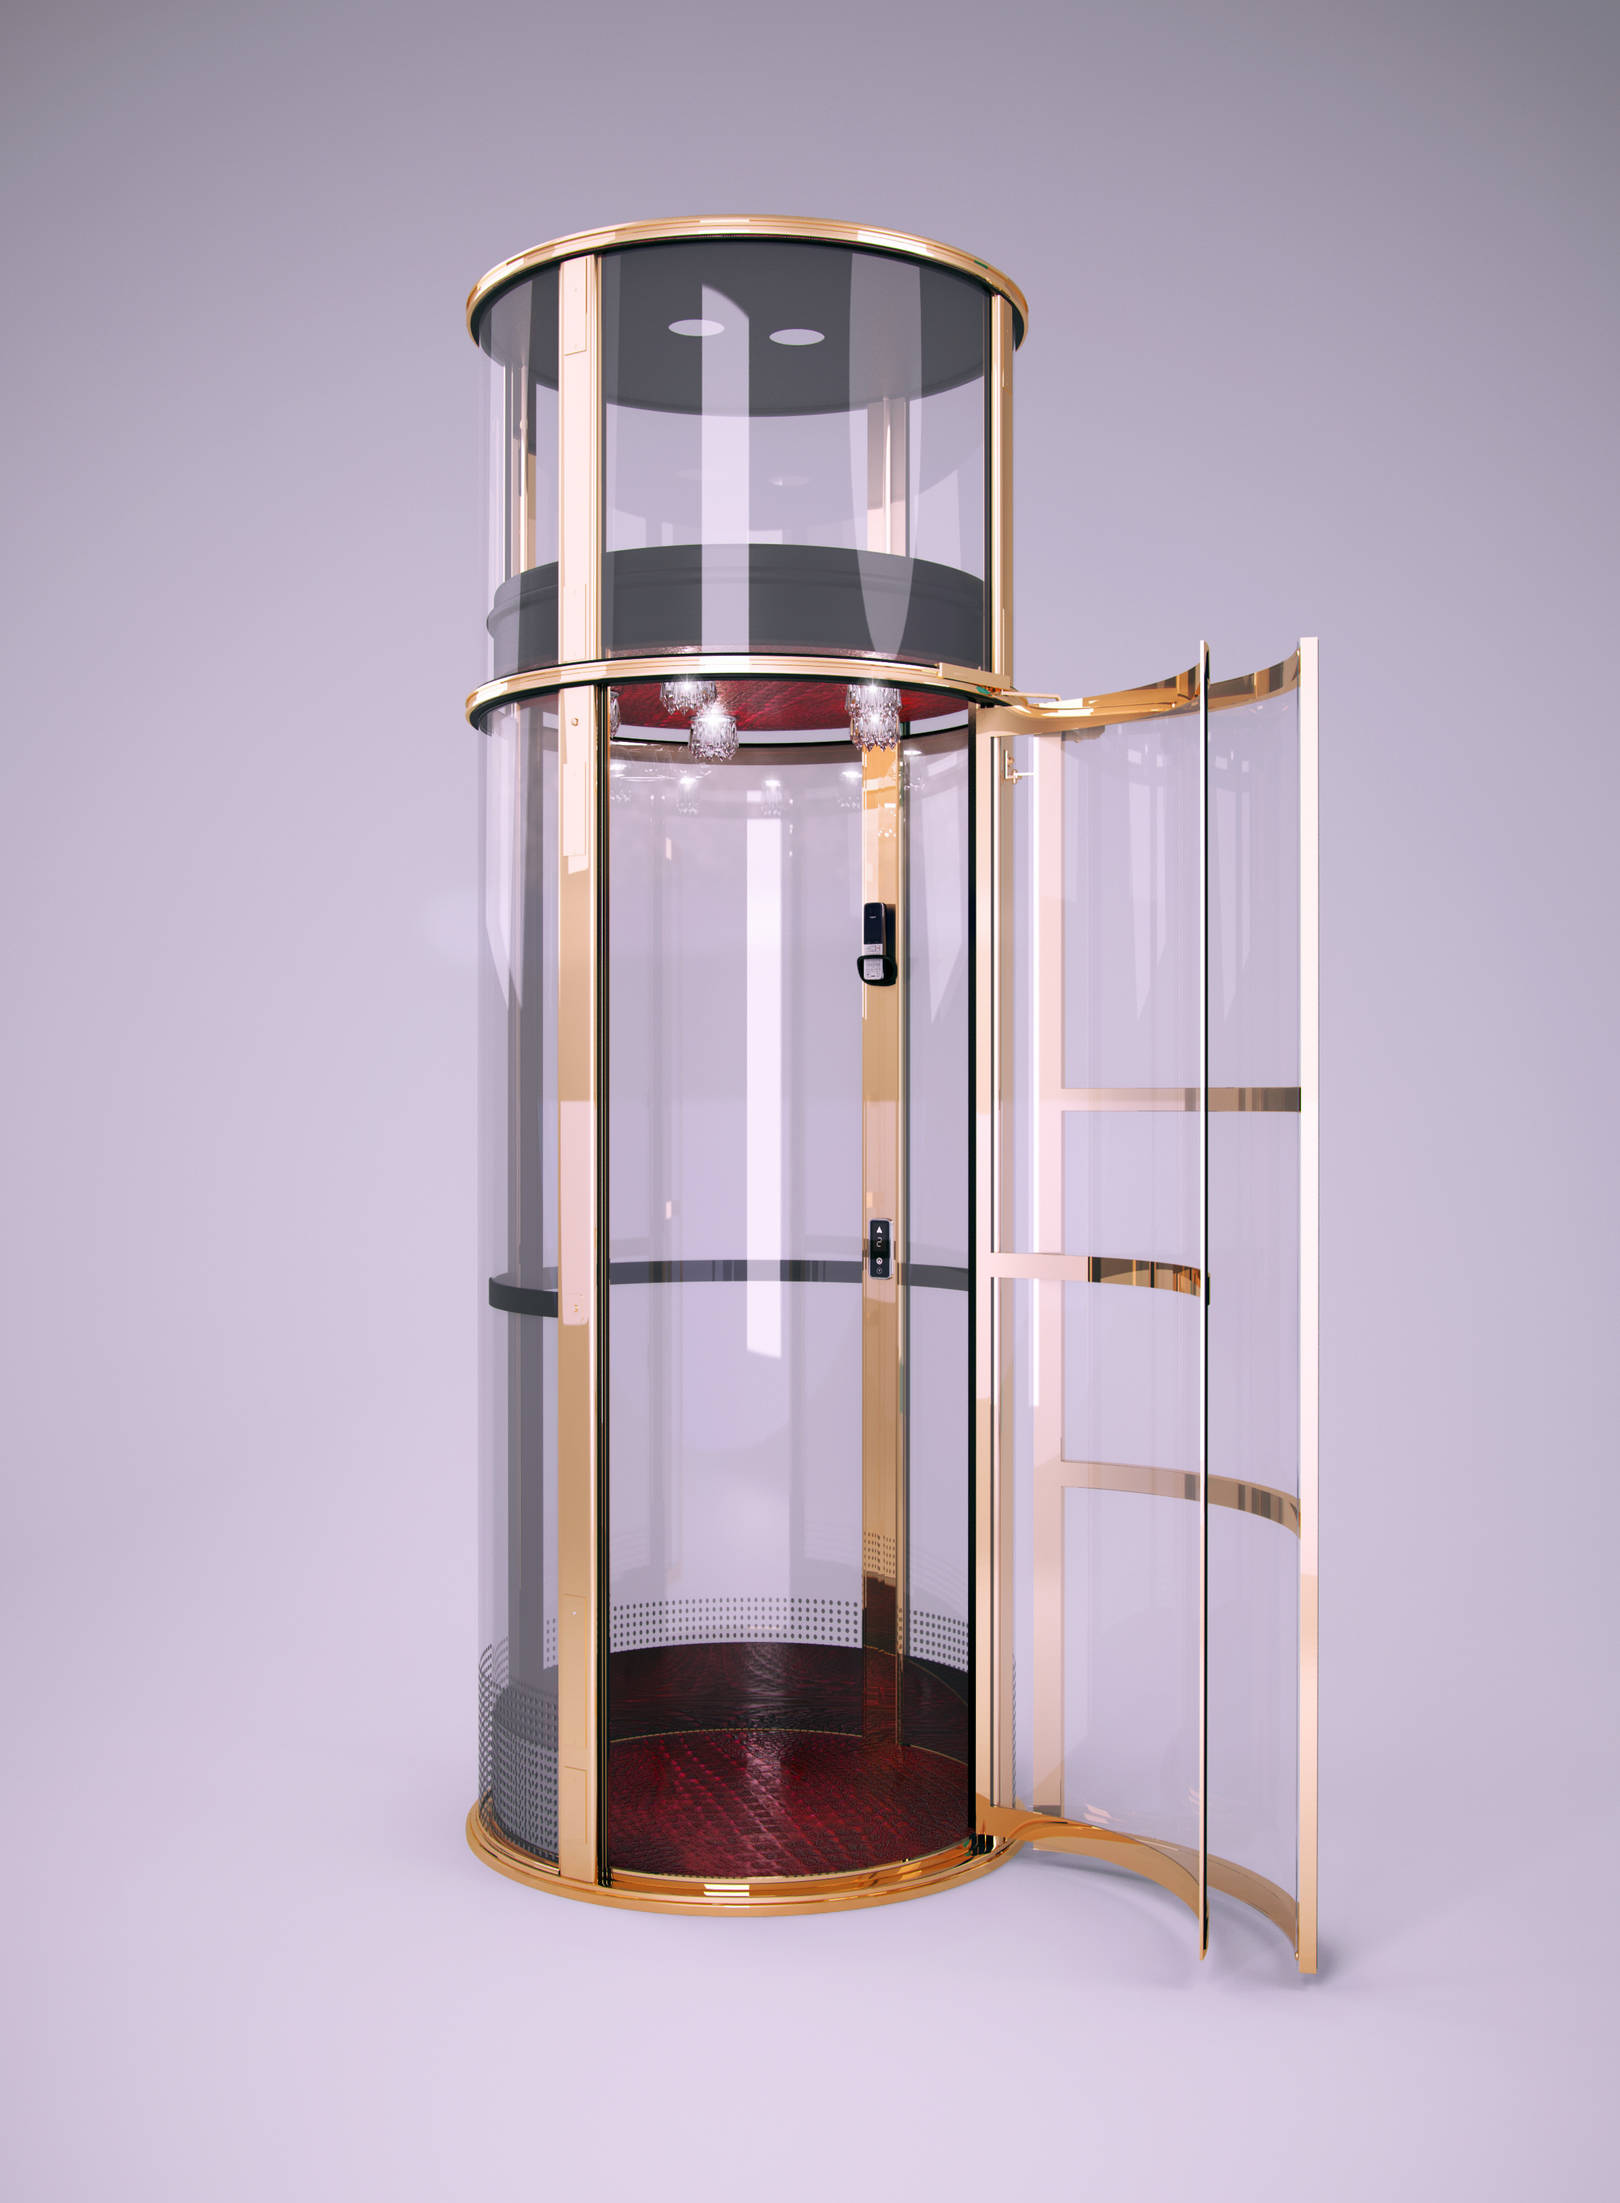 Лифт вакуумный золото(v-ray)